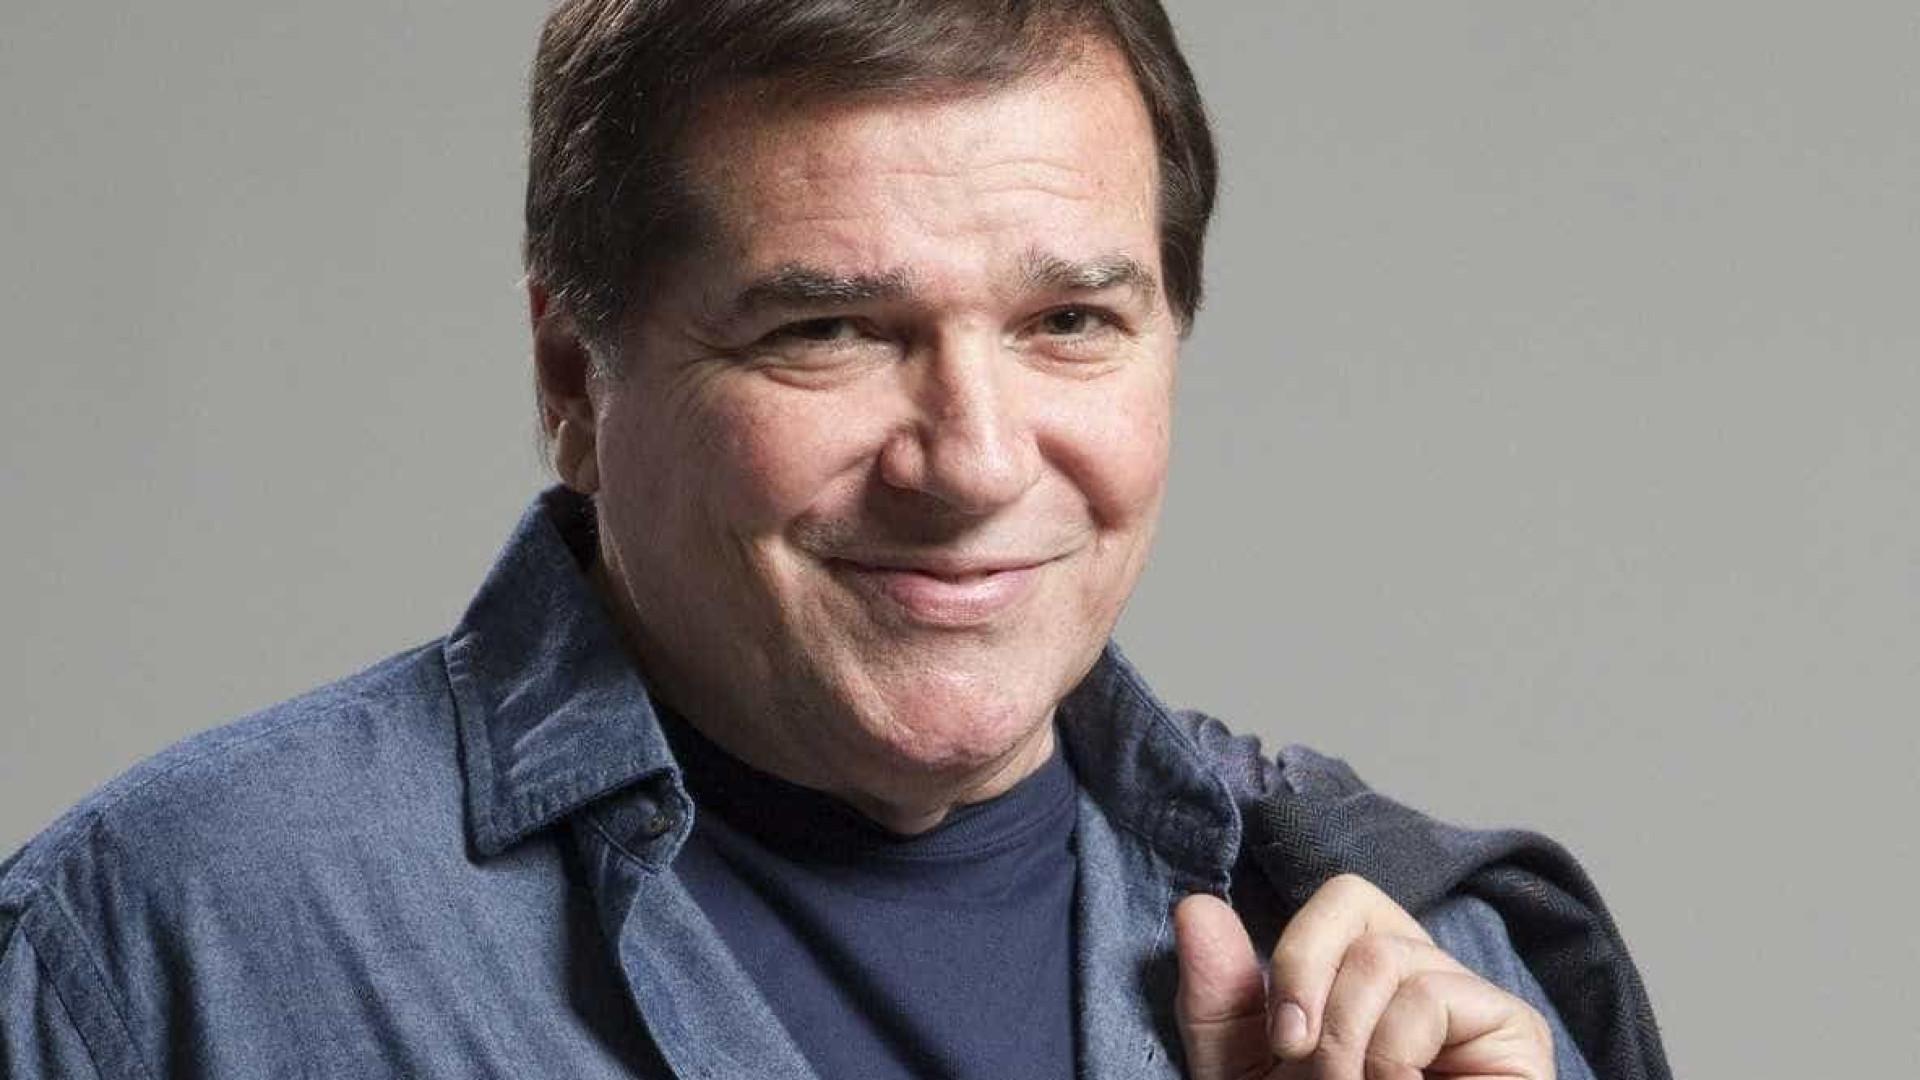 Morre o cantor Jerry Adriani aos 70 anos